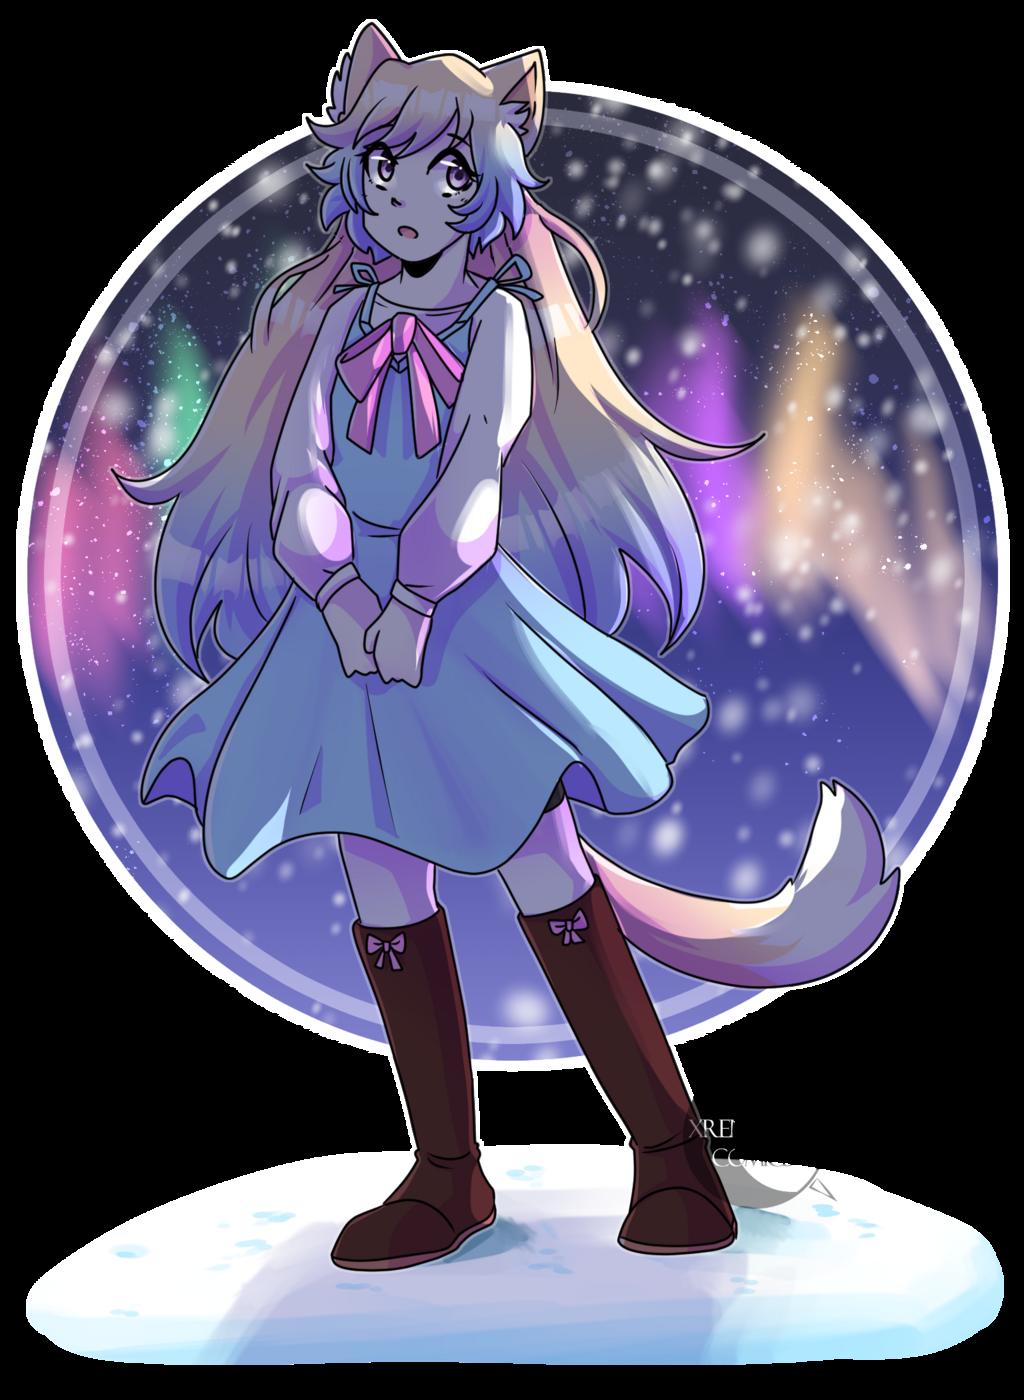 [AF] Snowa